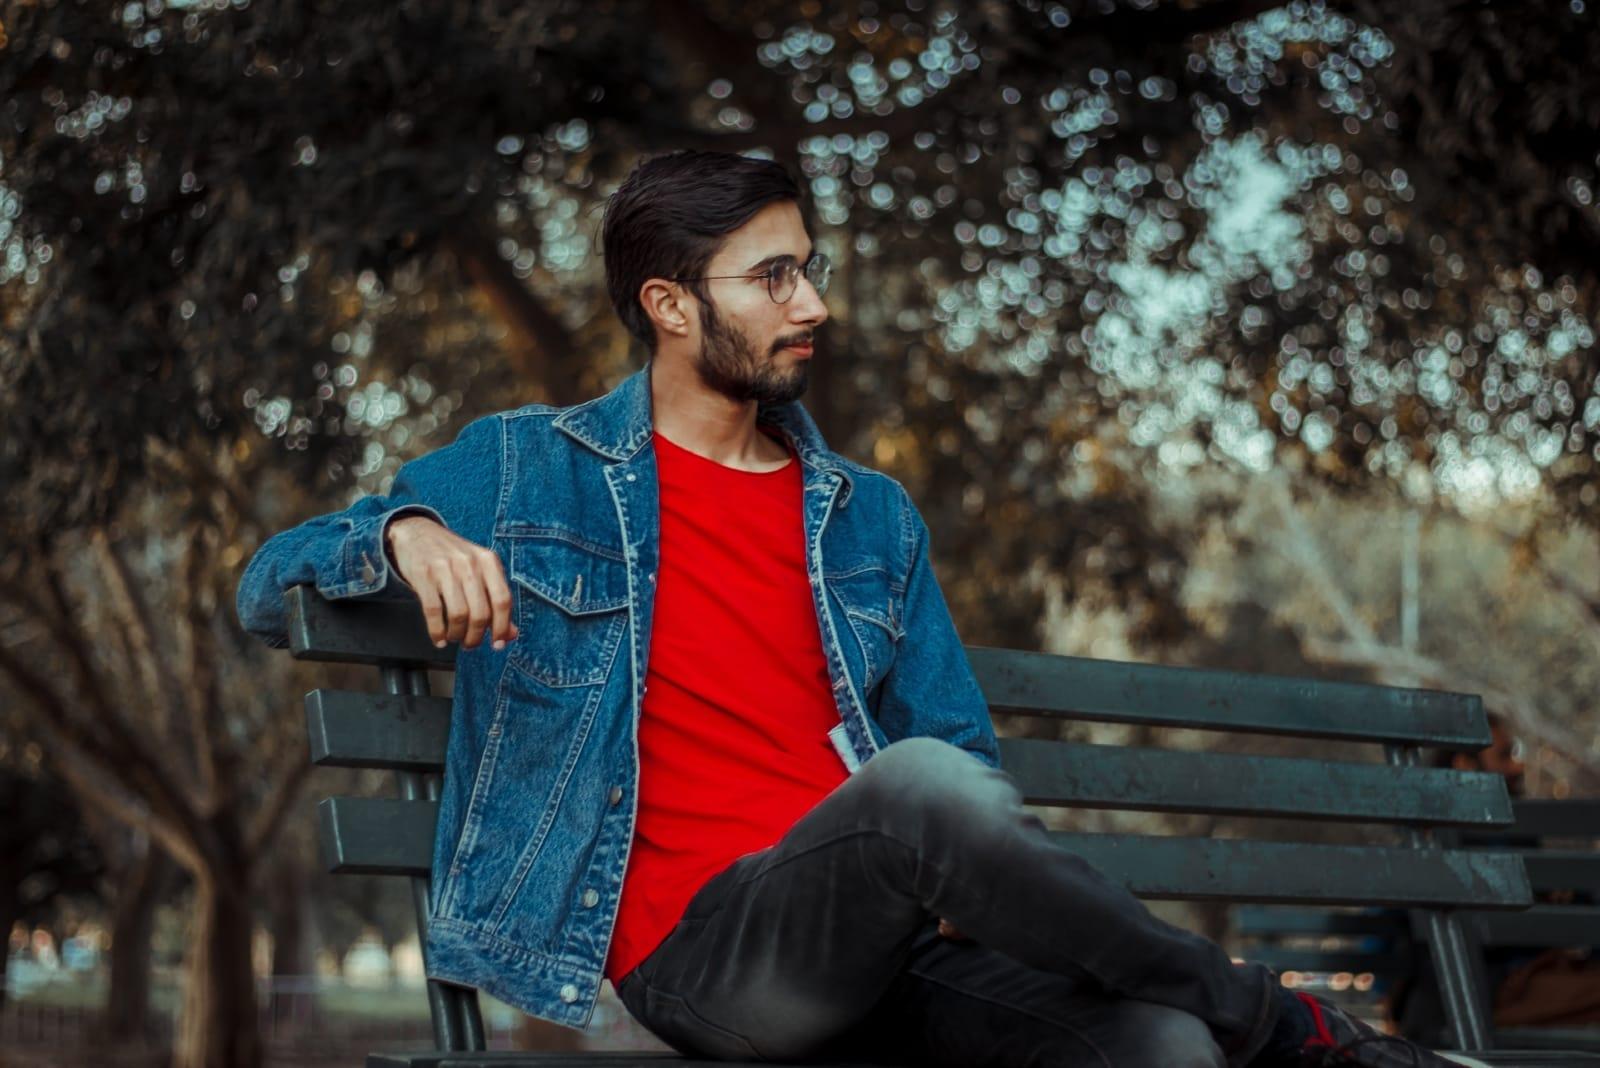 man in denim jacket sitting on bench